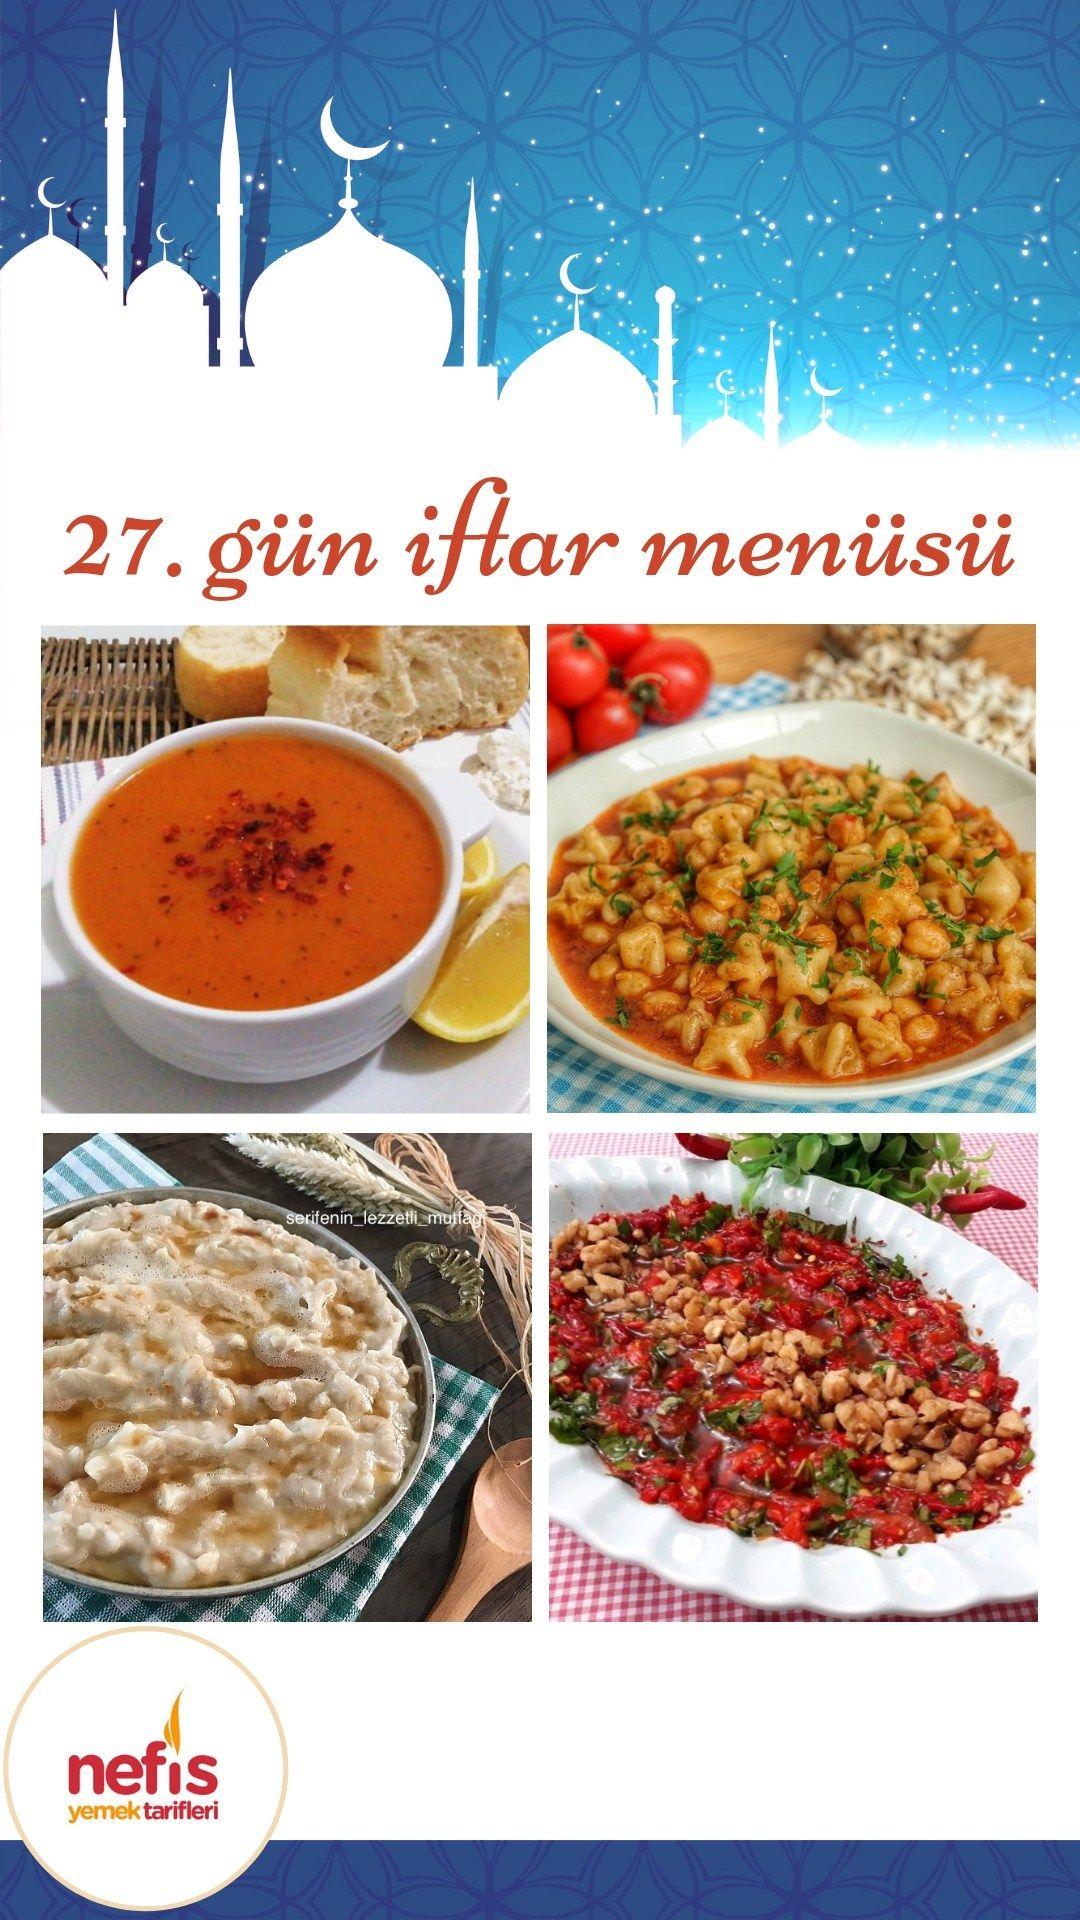 27 Gun Iftar Menusu Nefis Yemek Tarifleri Yemek Tarifleri Yemek Iftar